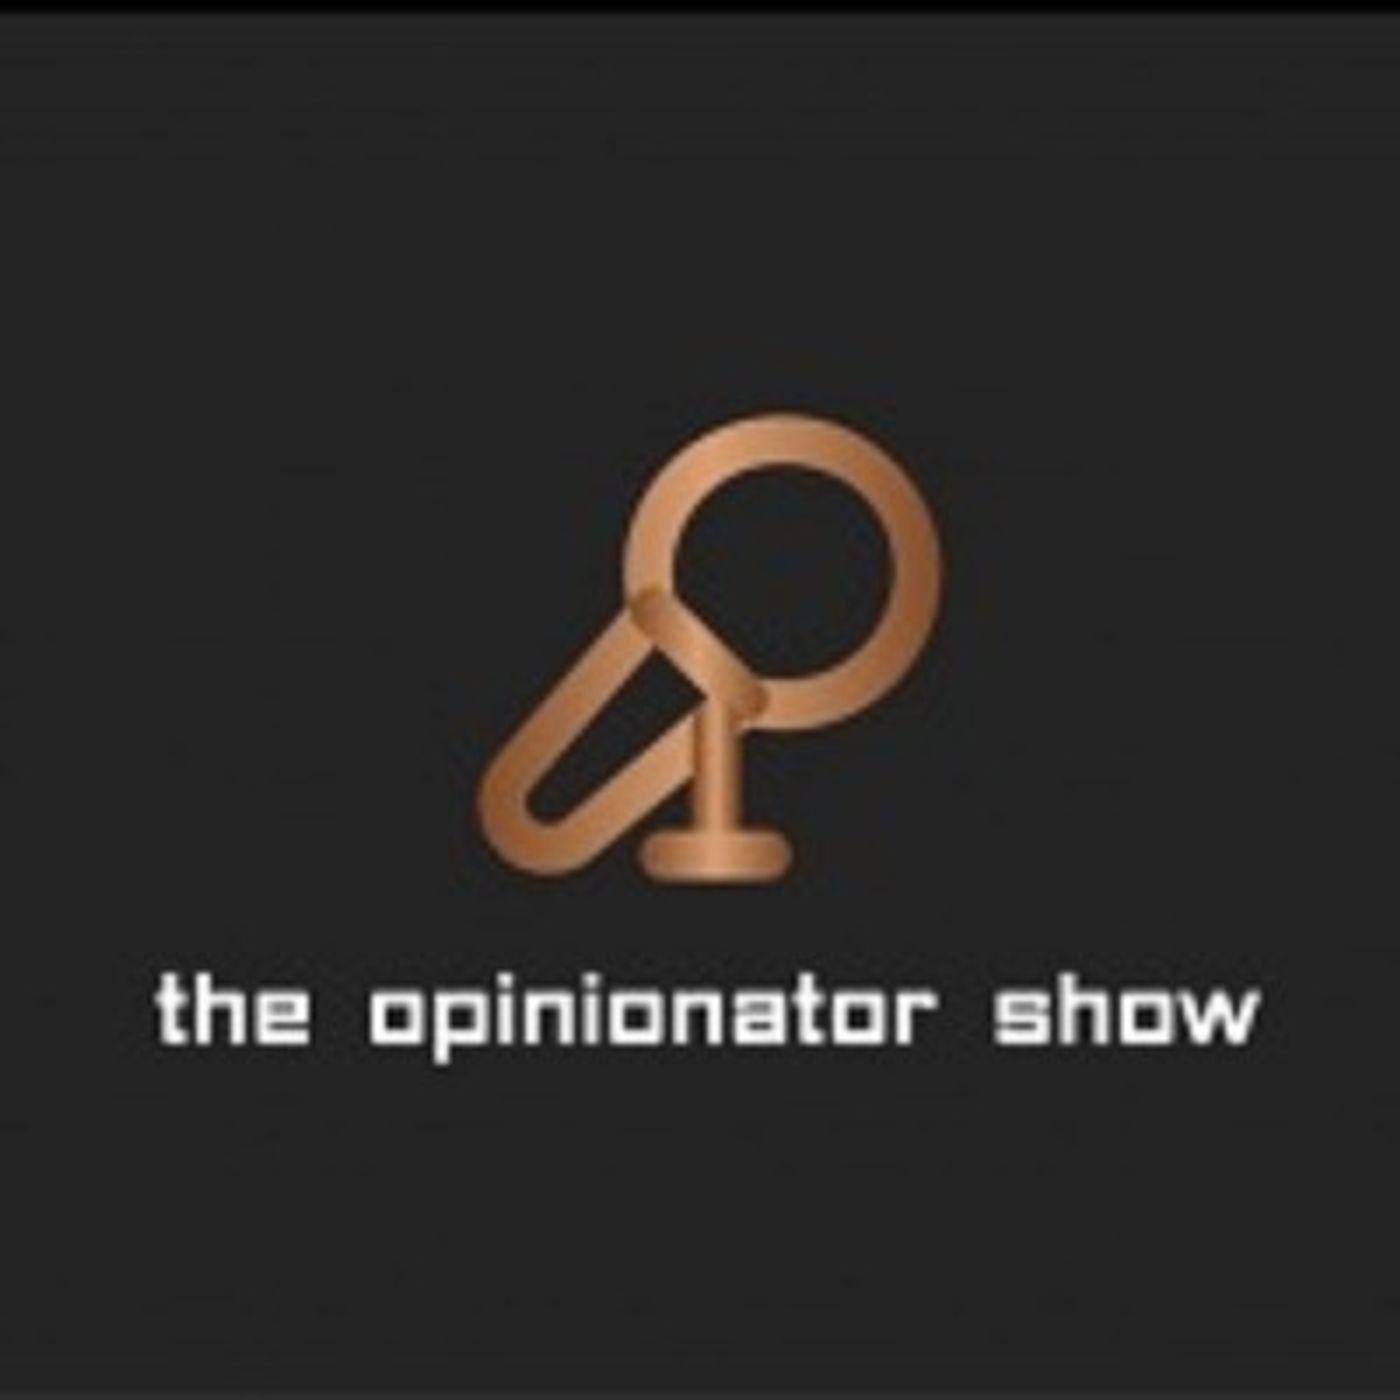 The Opinionator Show | 5/12/2021